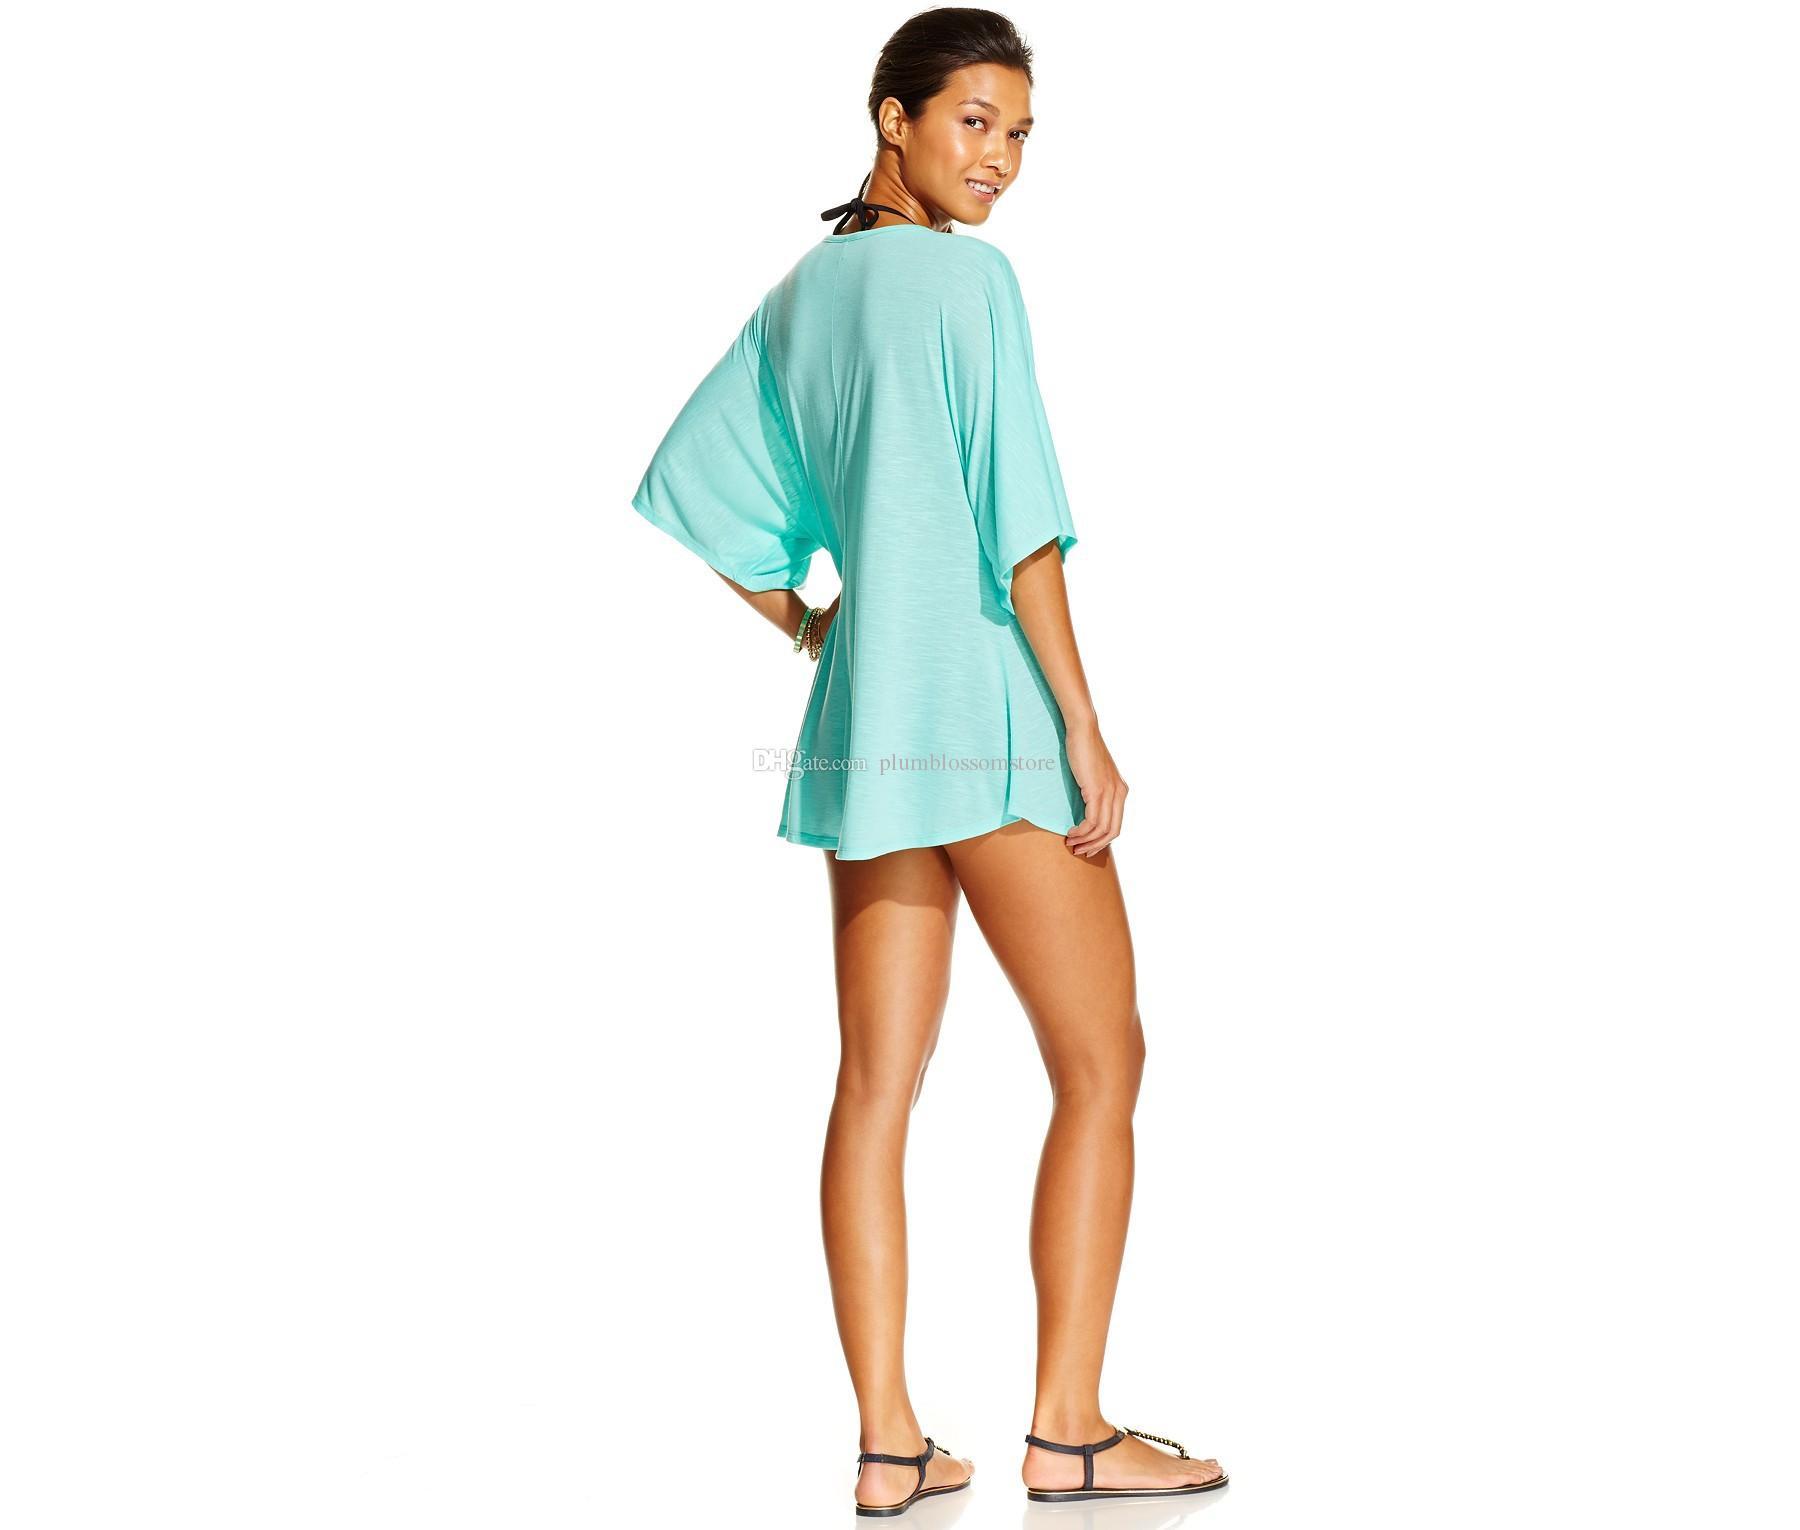 women summer LOVE printing loose t-shirts bikini cover ups beach bohemian sunscreen holiday seaside t-shirts blouses tops swimwear beachwear